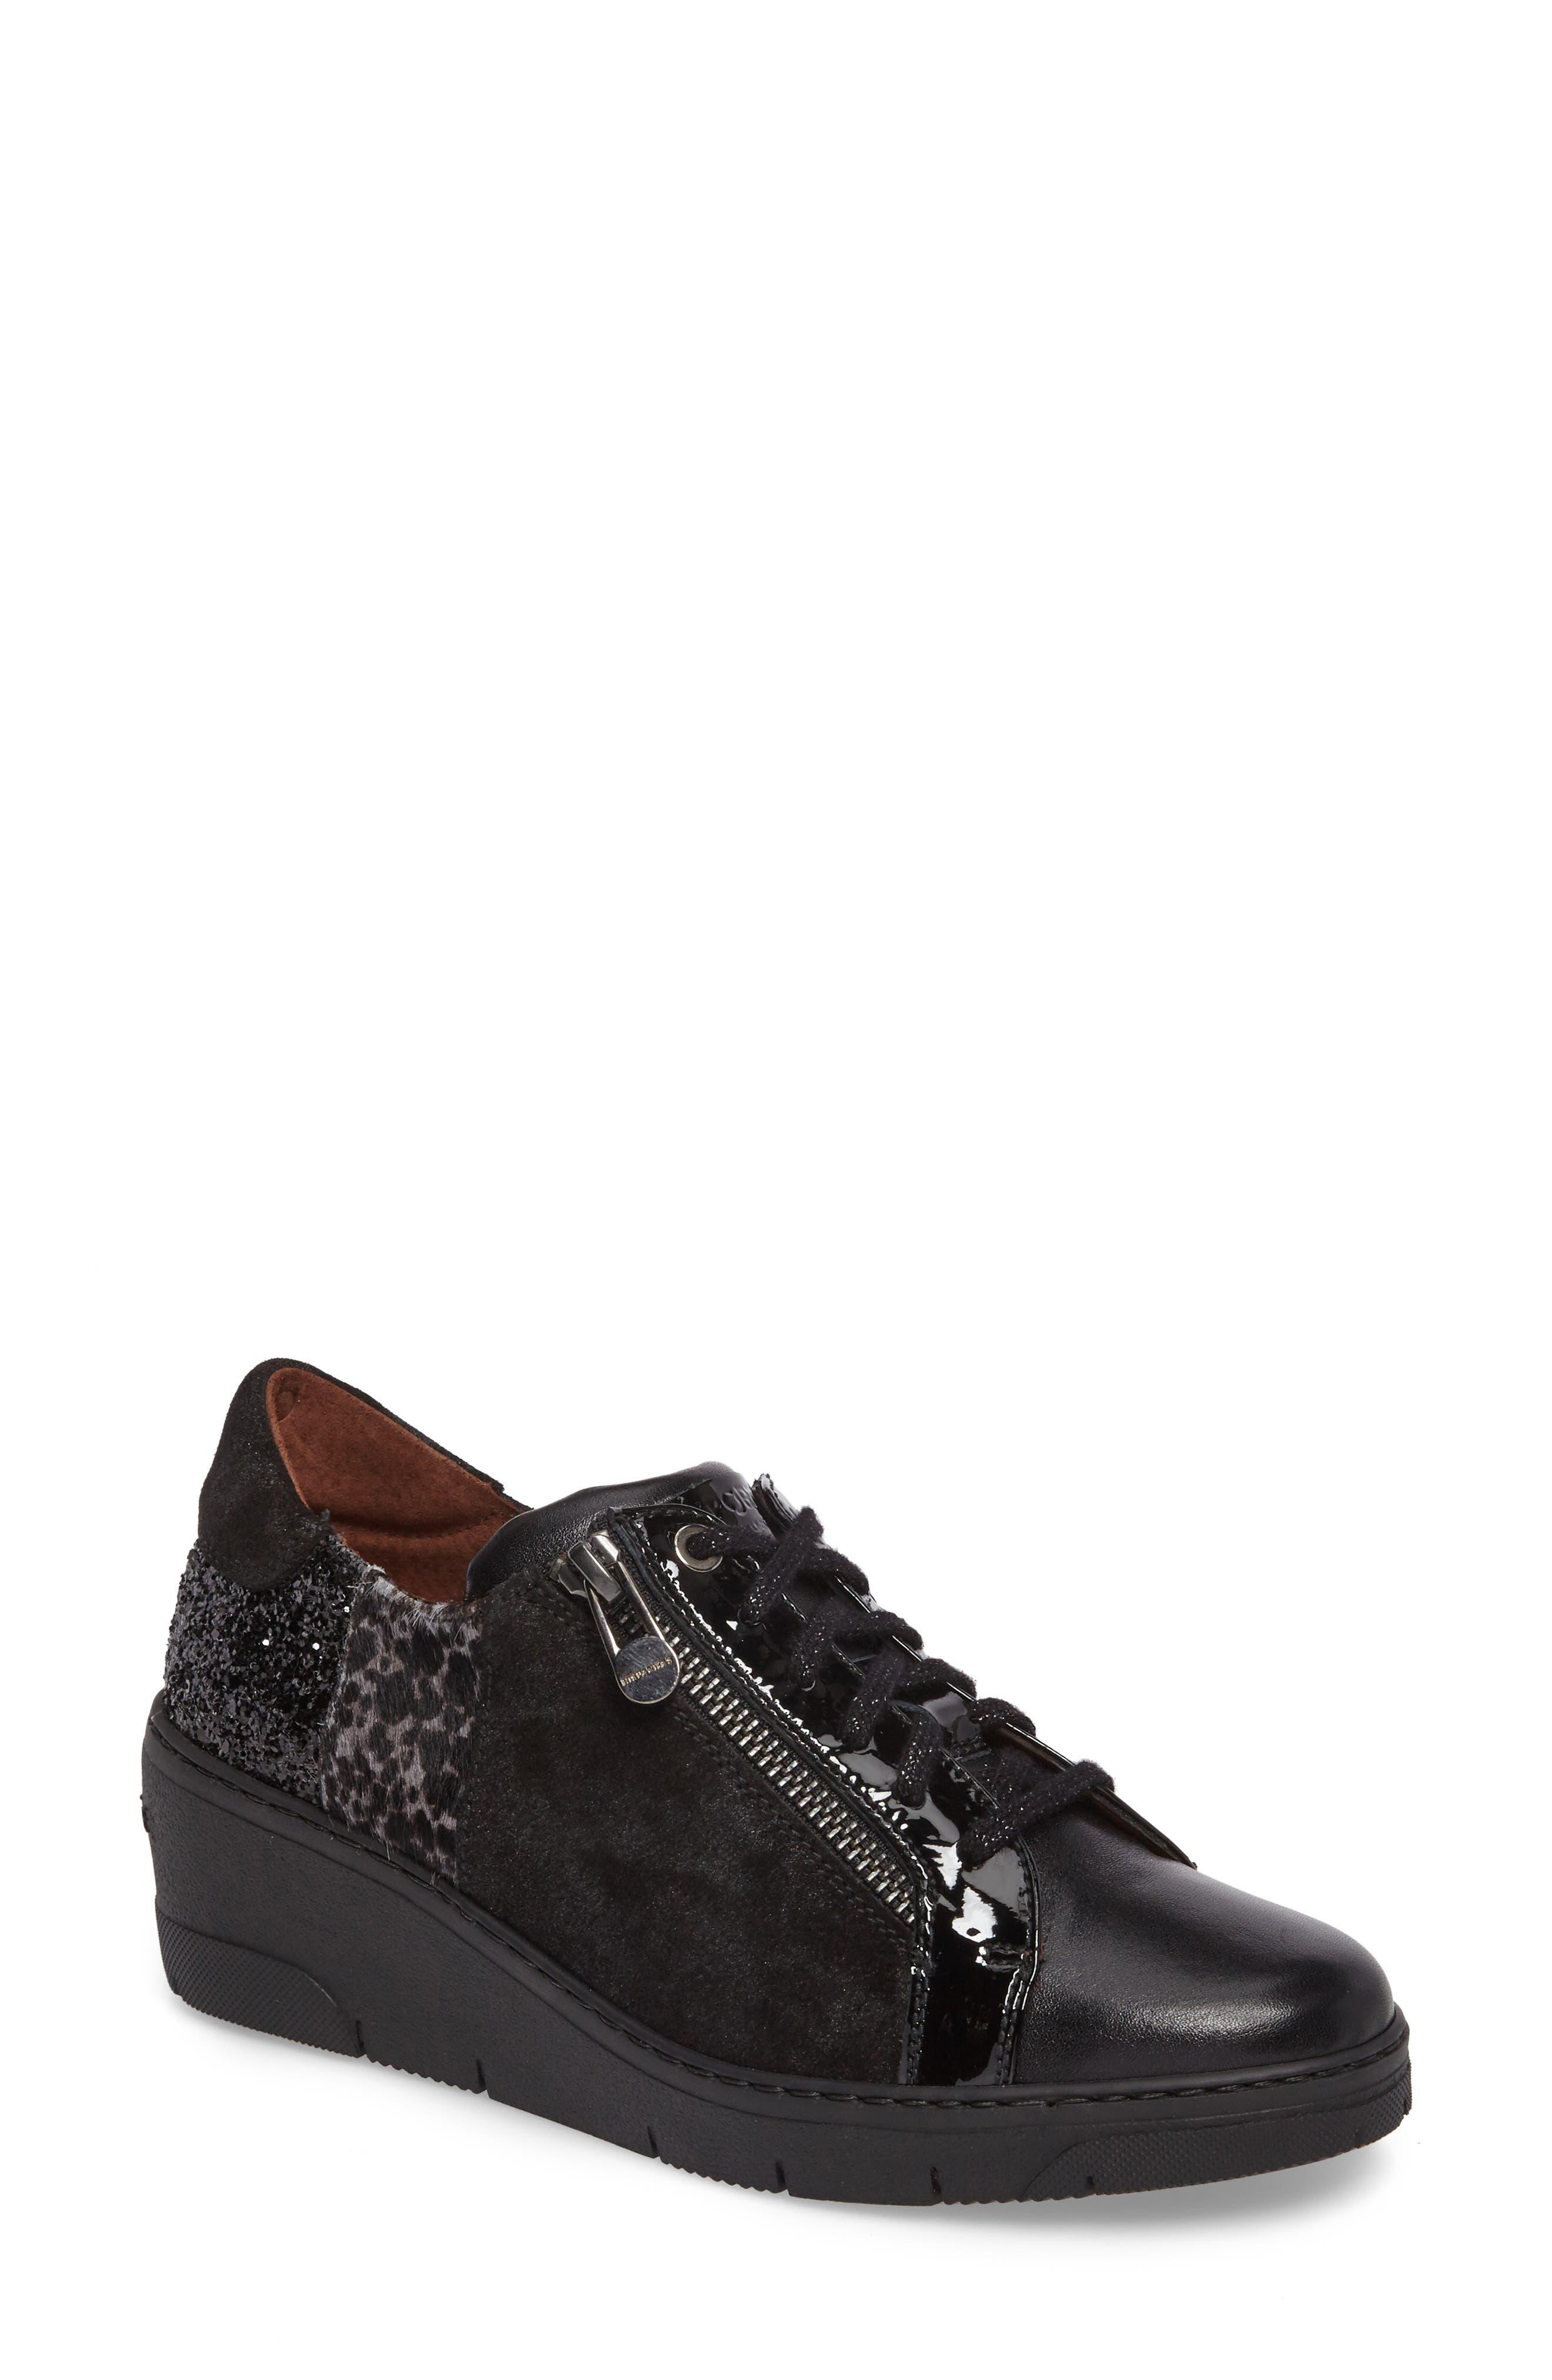 Sammi Sneaker,                         Main,                         color, 001